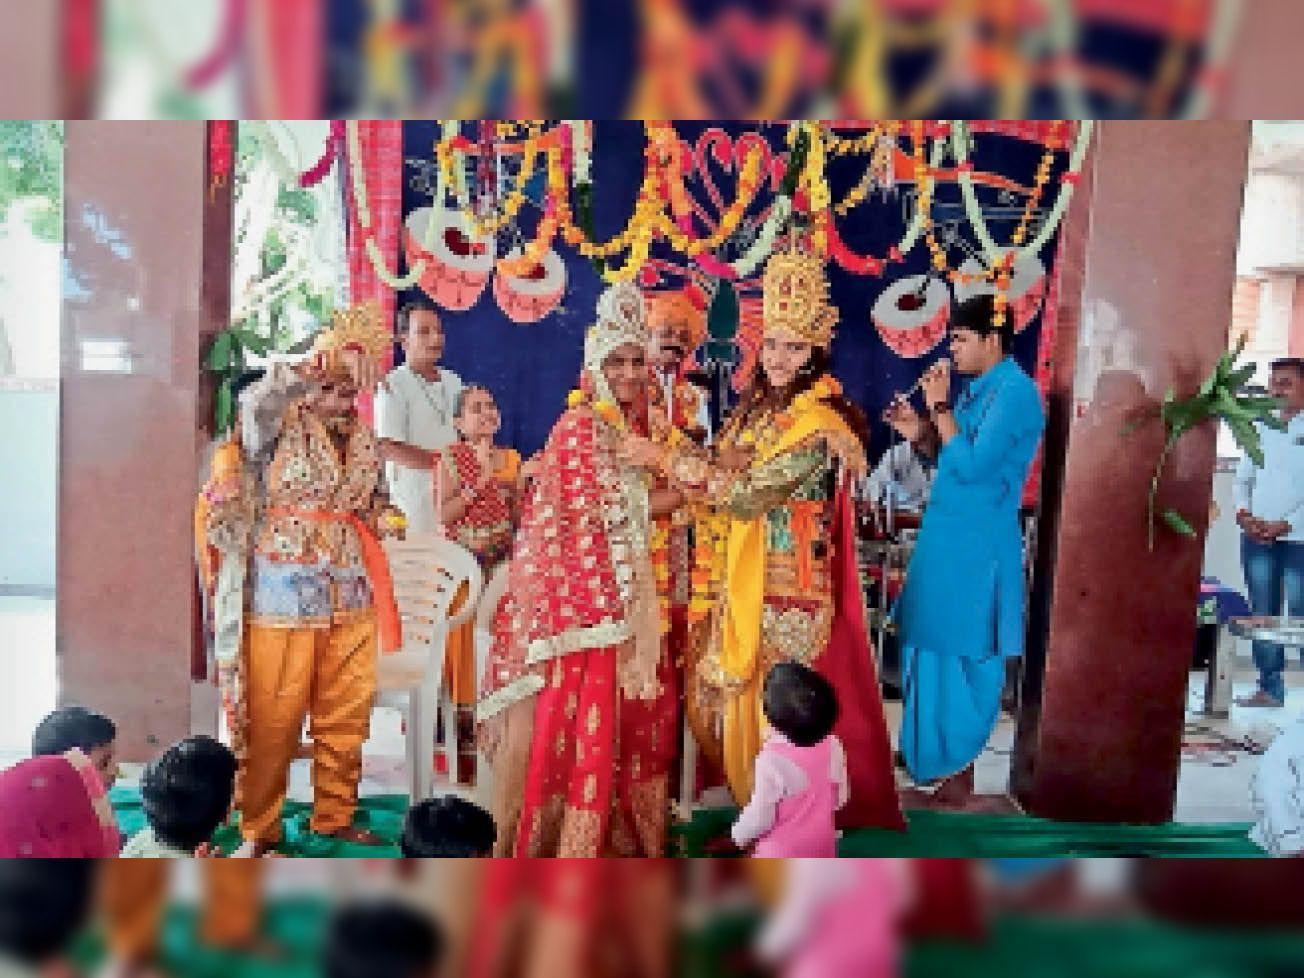 कृष्ण-रुक्मिणी विवाह प्रसंग की प्रस्तुति देते हुए कलाकार। - Dainik Bhaskar